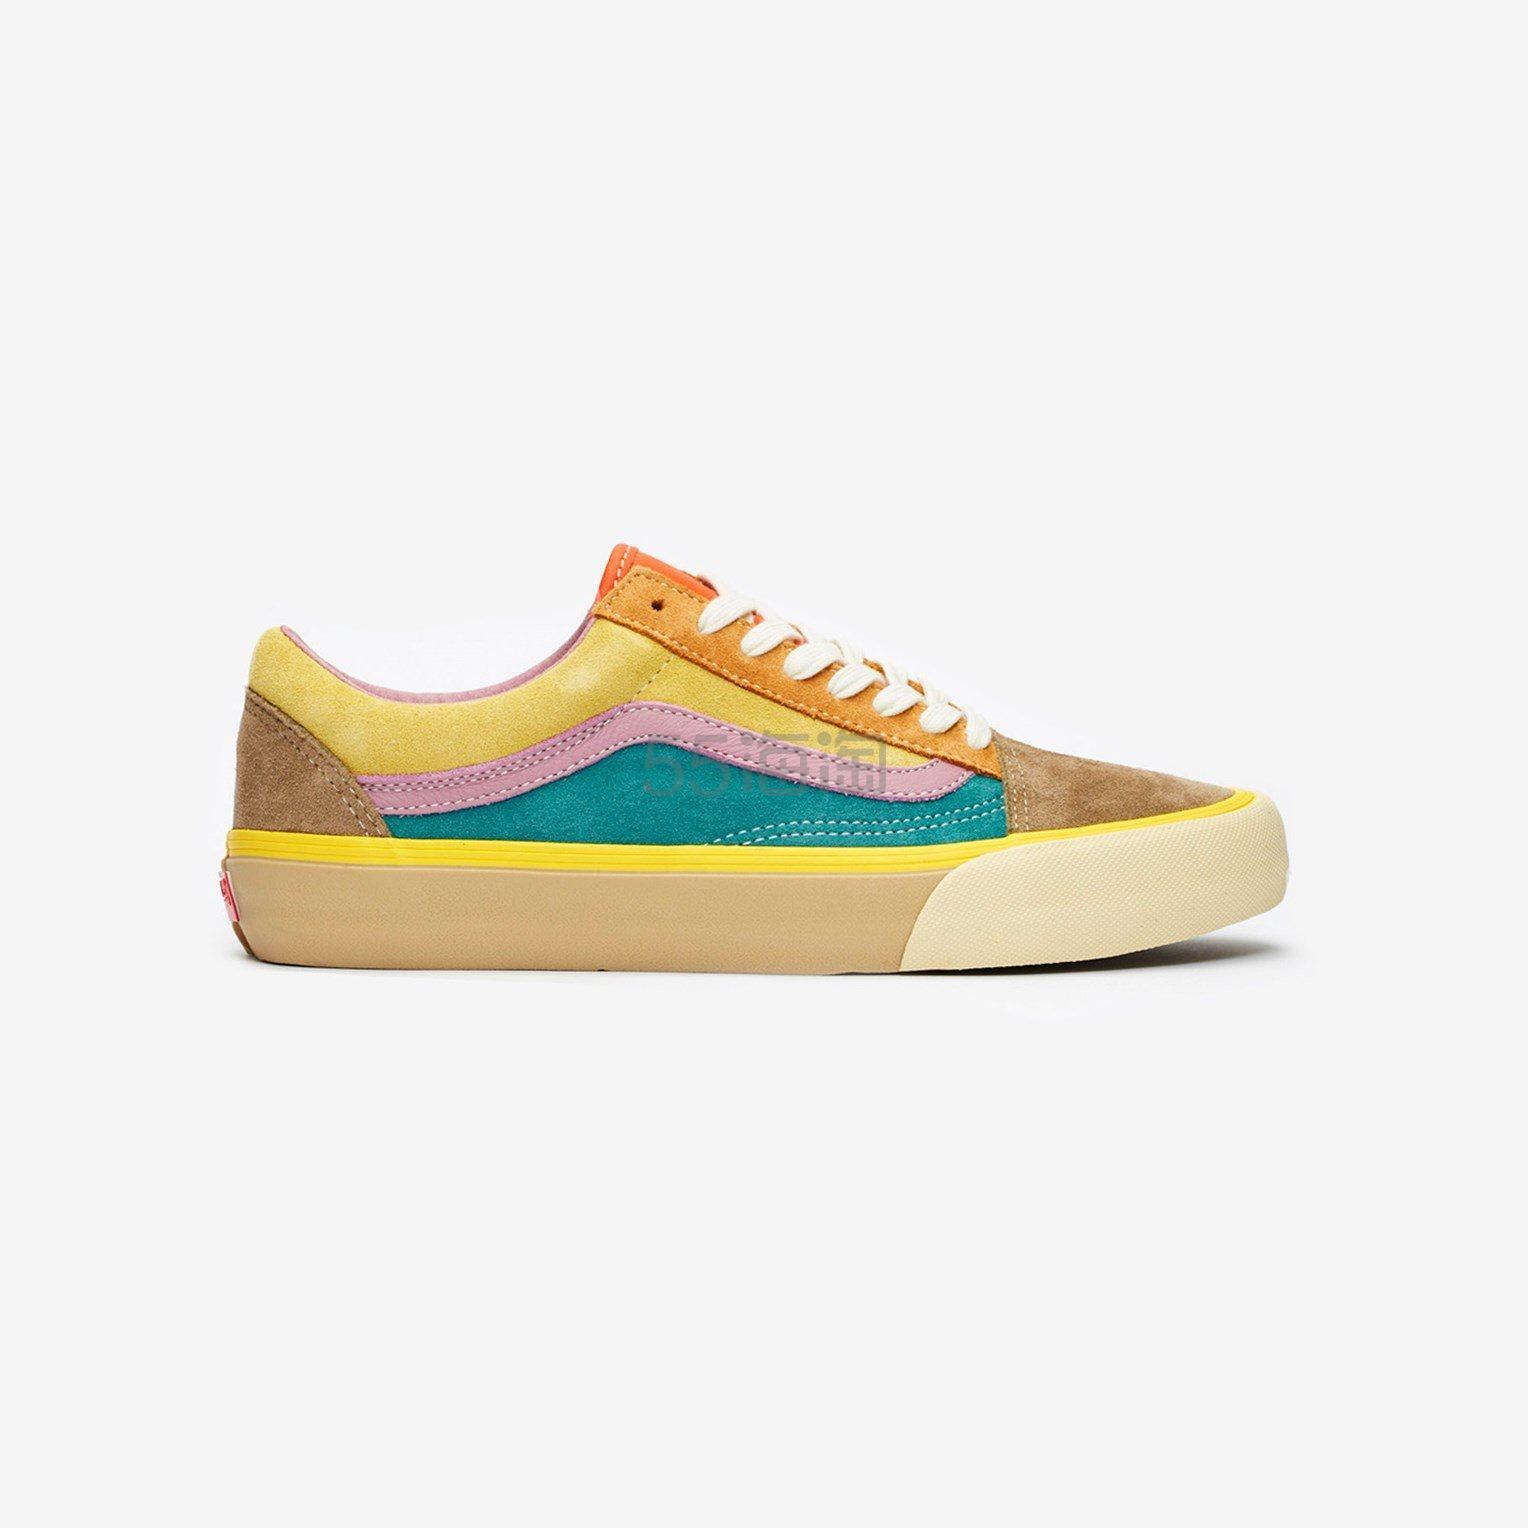 Vans Old Skool VLT LX 女款拼色滑板鞋 .3(约383元) - 海淘优惠海淘折扣|55海淘网